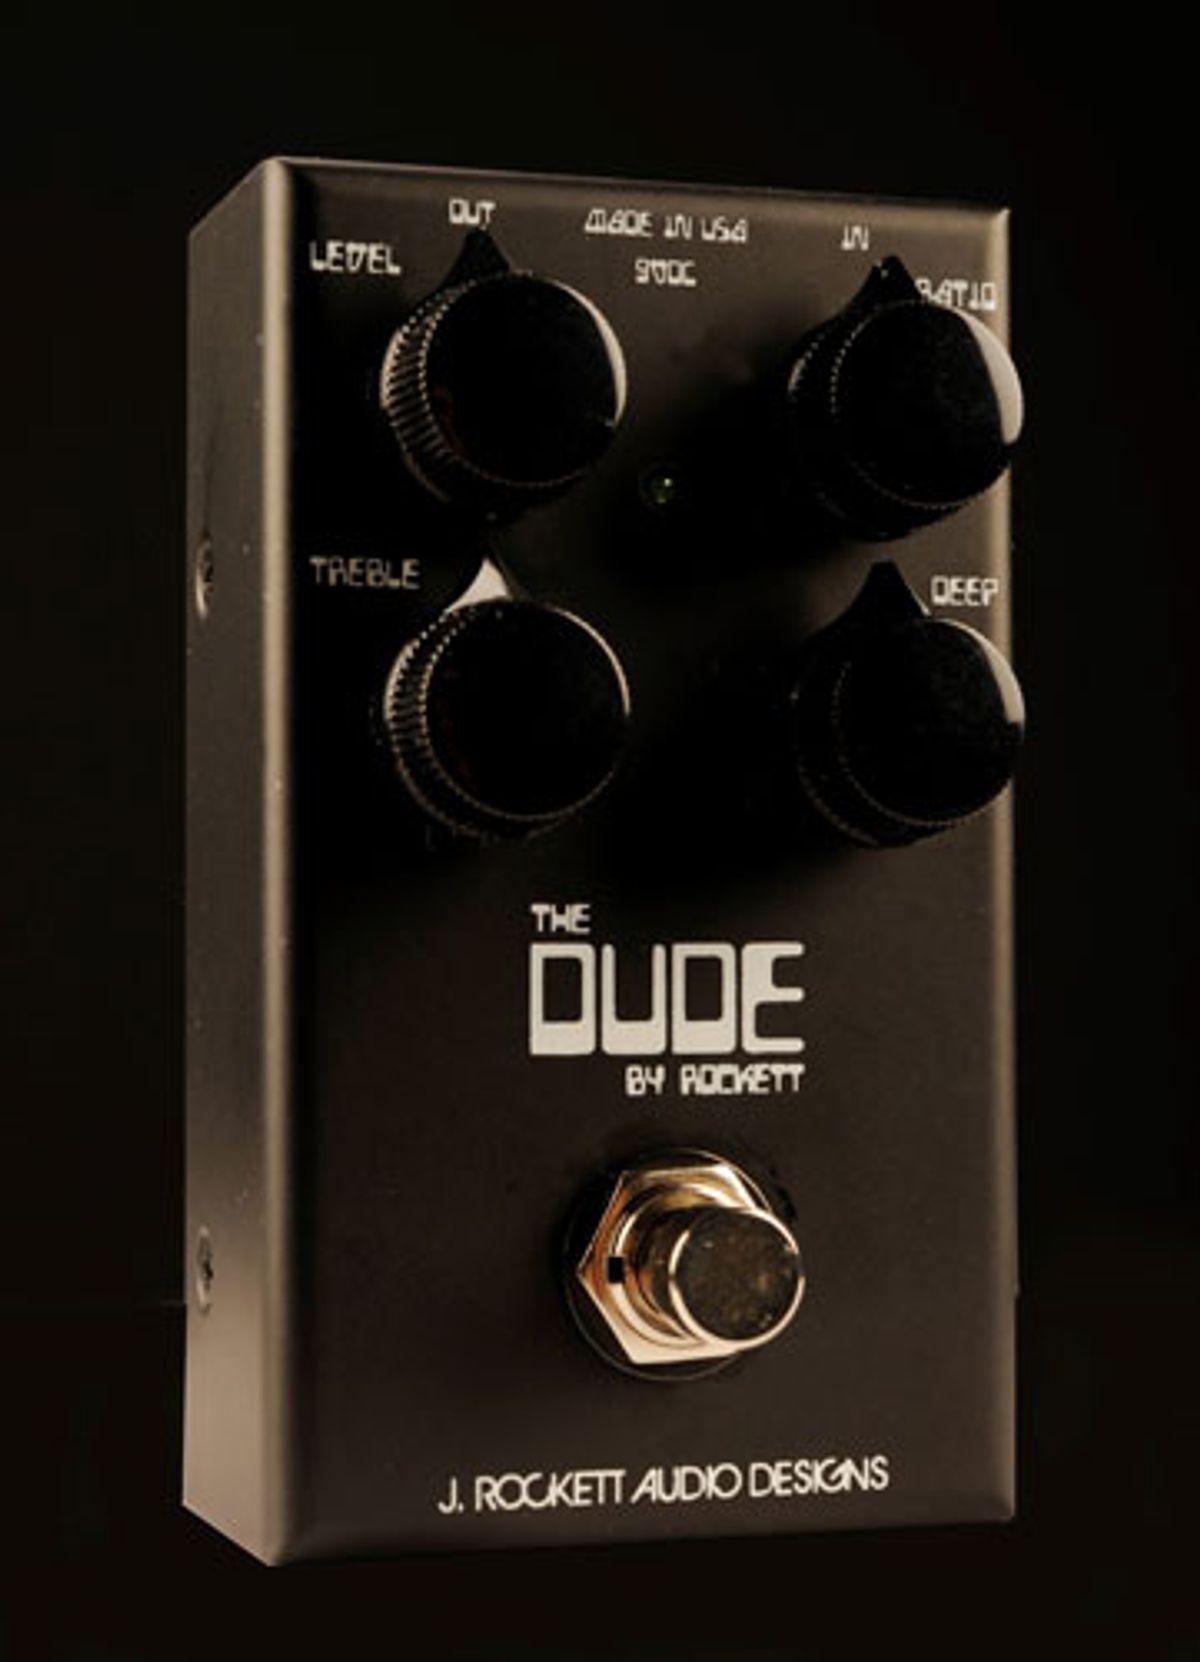 J. Rockett Audio Designs Introduces the Dude